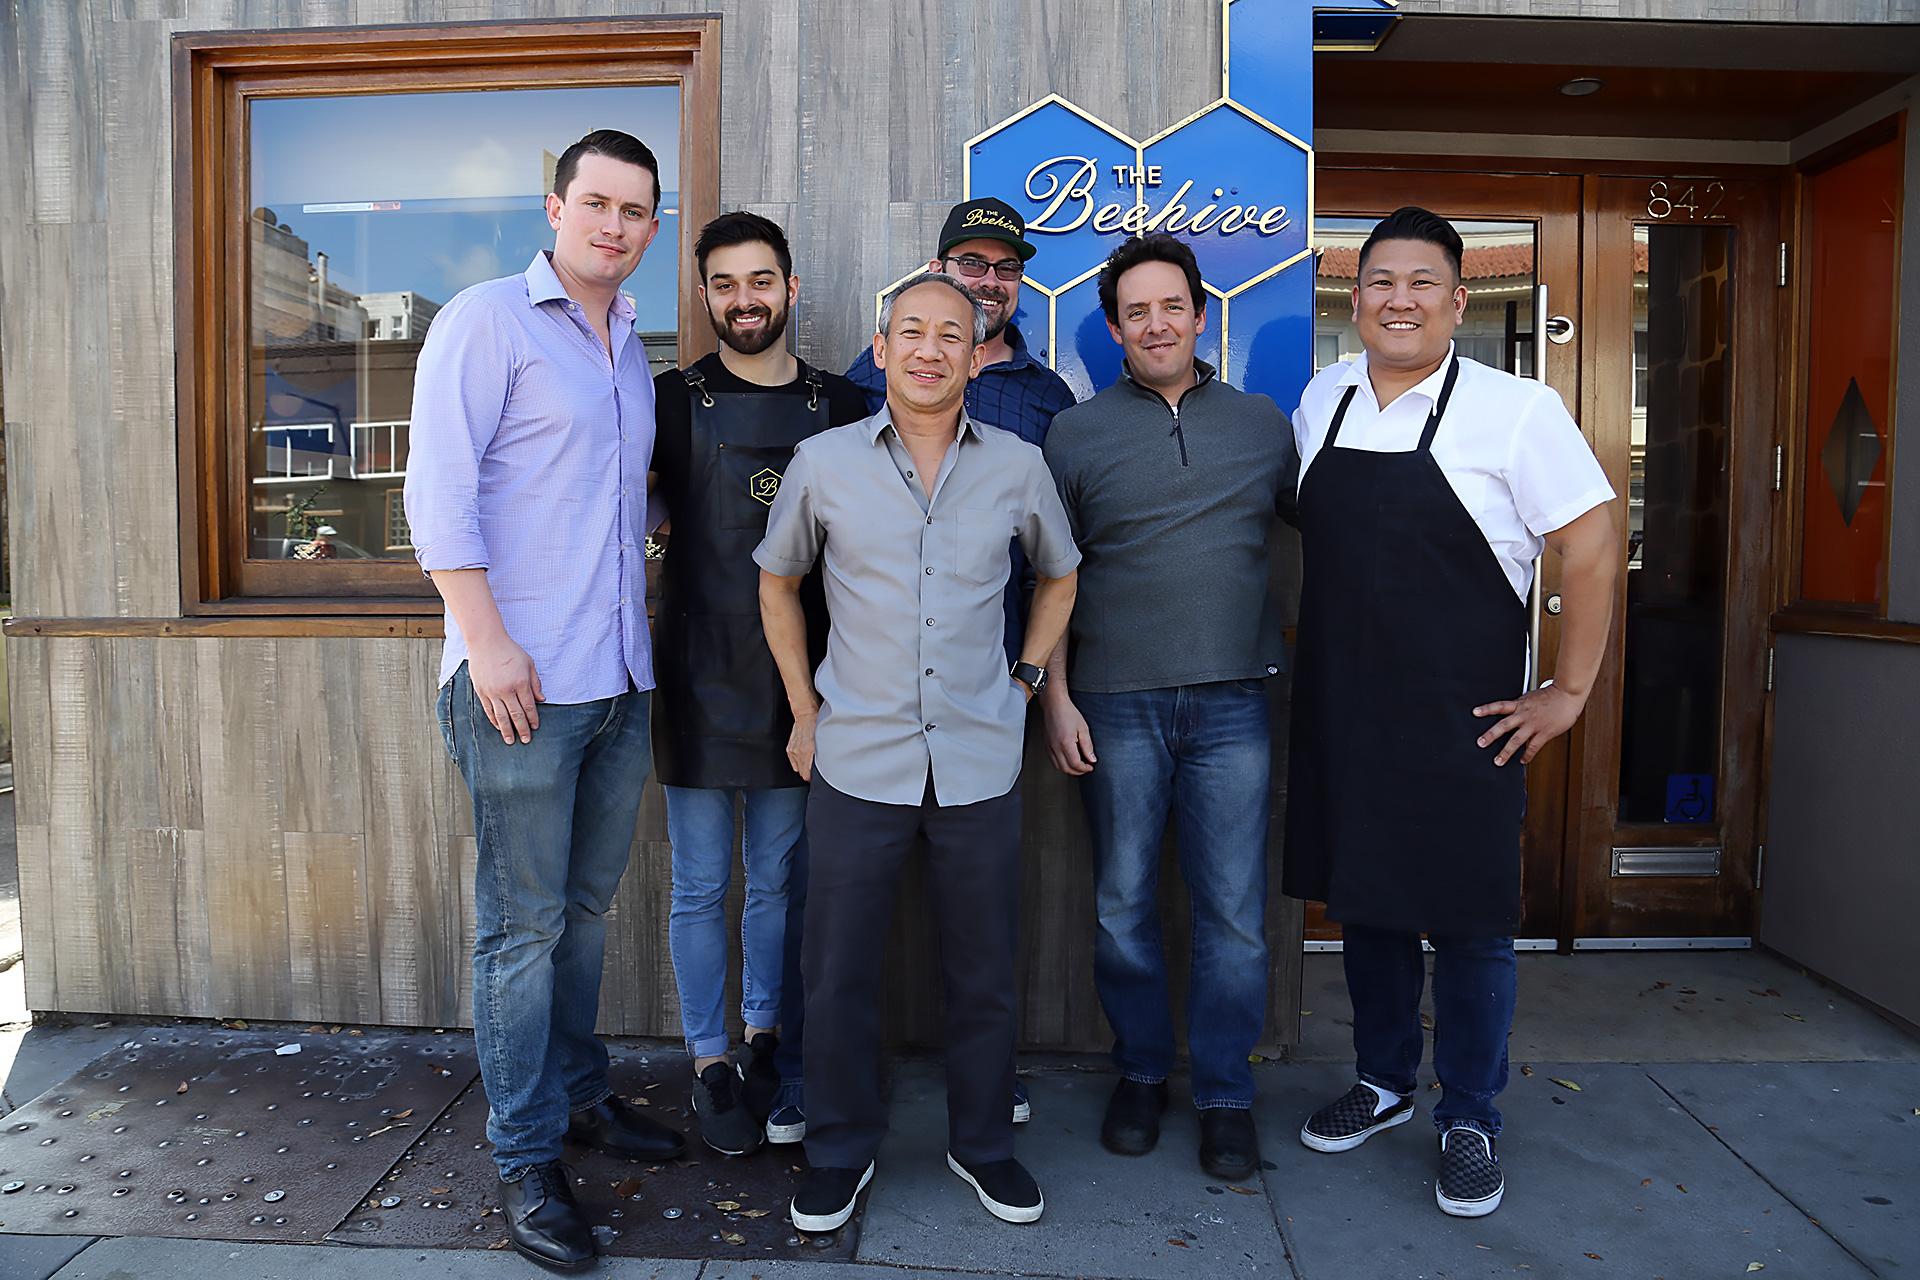 Most of The Beehive Crew (L to R): general manager Tristen Philippart de Foy, lead bartender Emilio Salehi, partner/chef Arnold Eric Wong,  partner/designer Steve Werney, partner/chef Phil West, chef Byron Gee